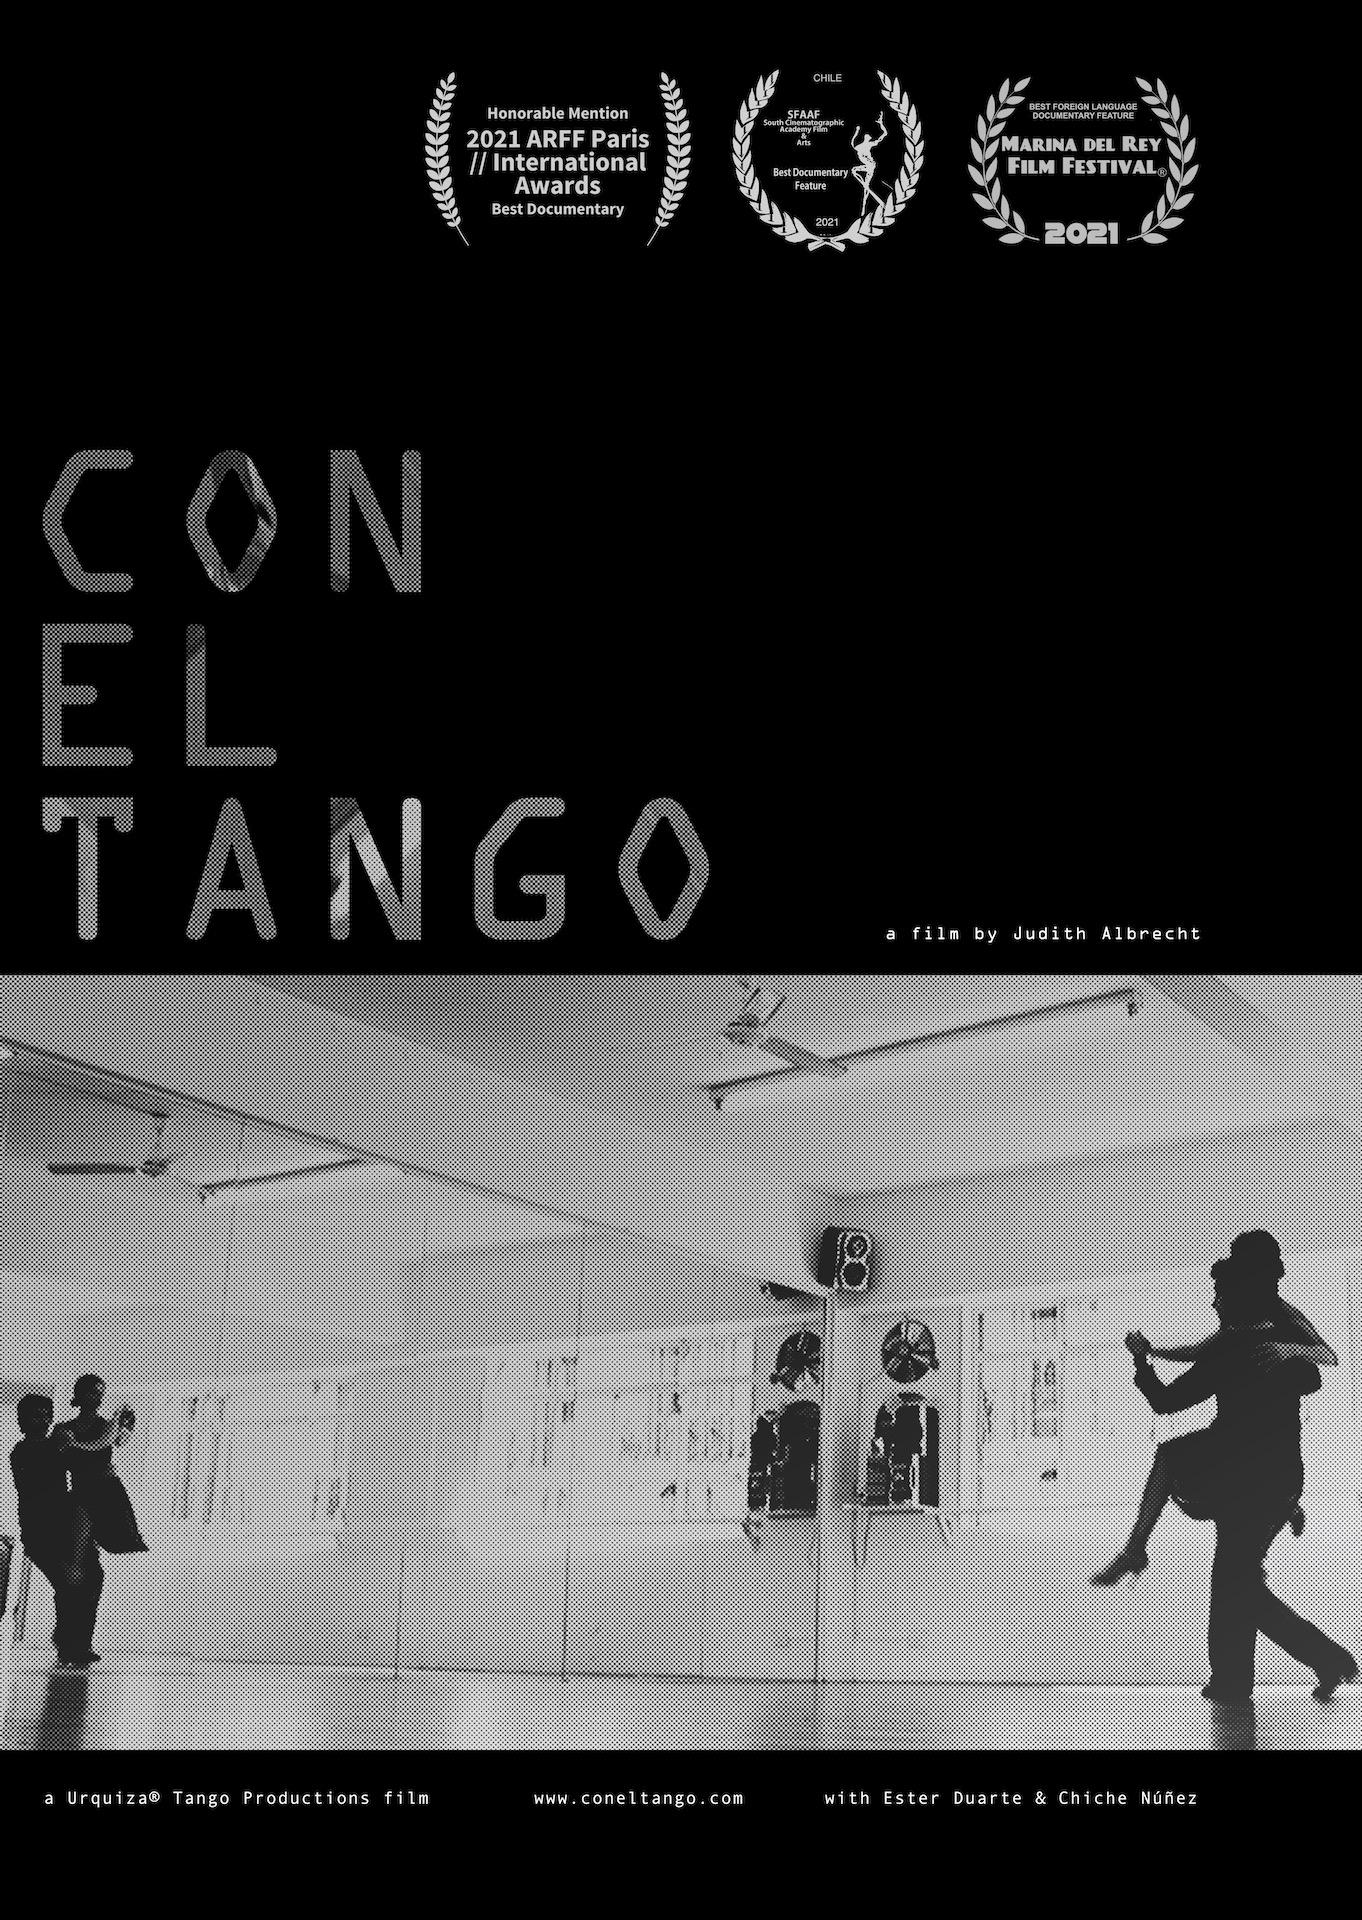 Con El Tango Poster mit Laurels - Dokumentar Film uber Urquiza Tango Argentino mit Chiche Nunez, Ester Duarte y Jose Brahemcha